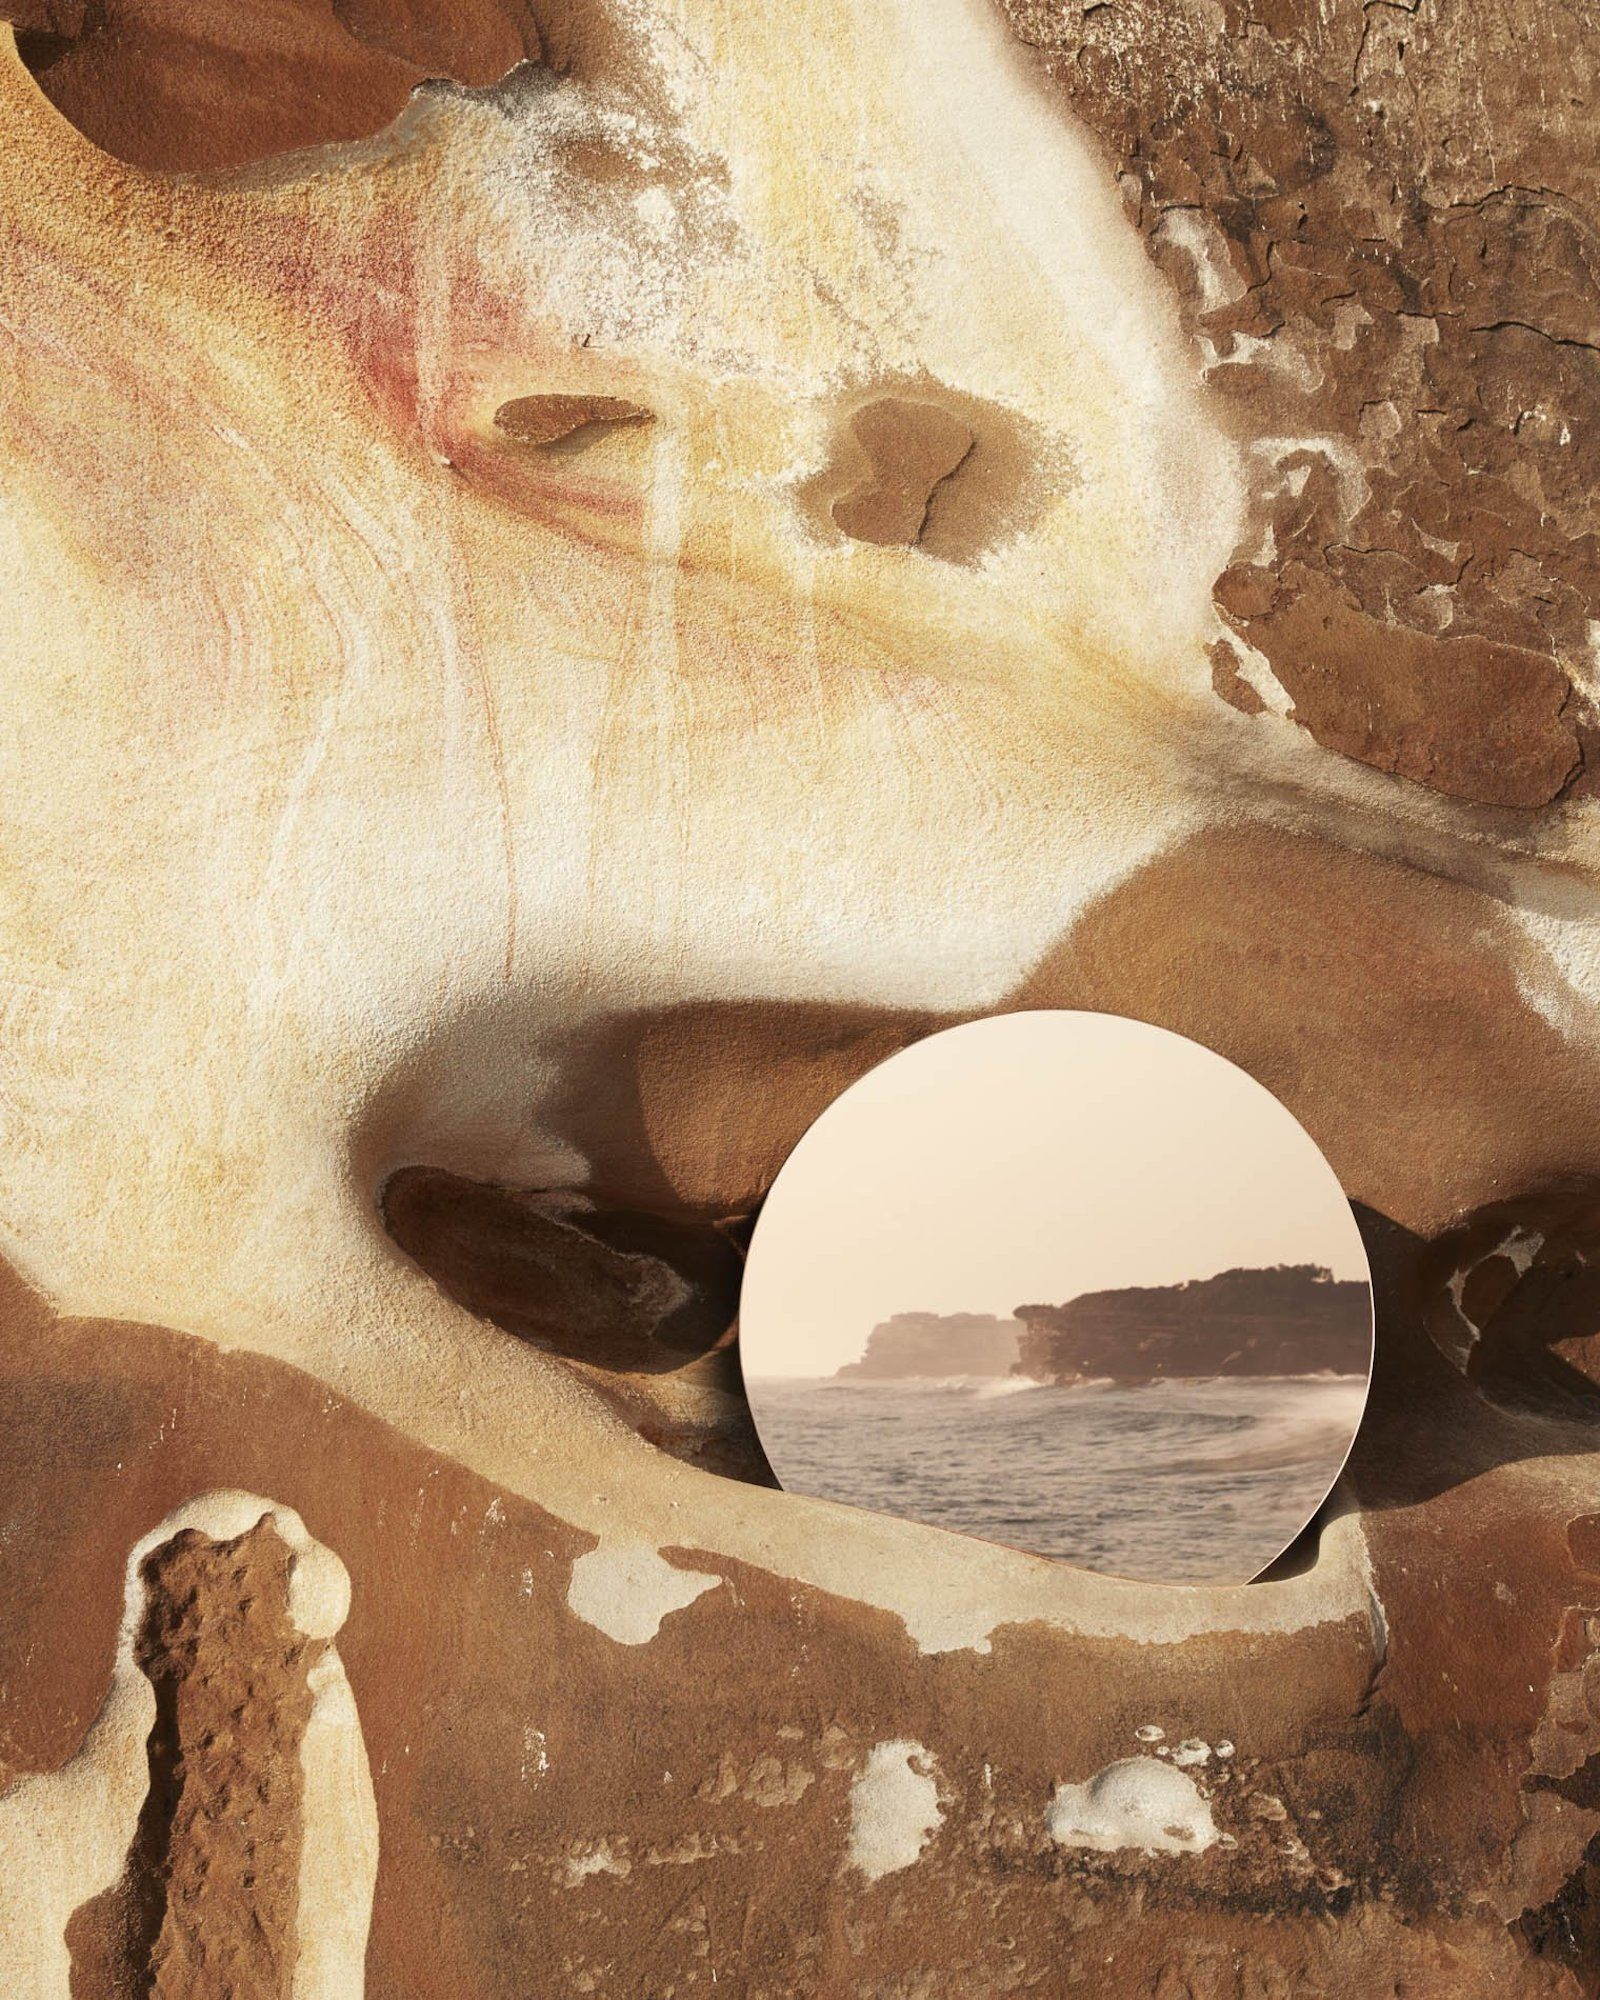 iGNANT-Design-Sarah-Ellison-The-New-Wave-008